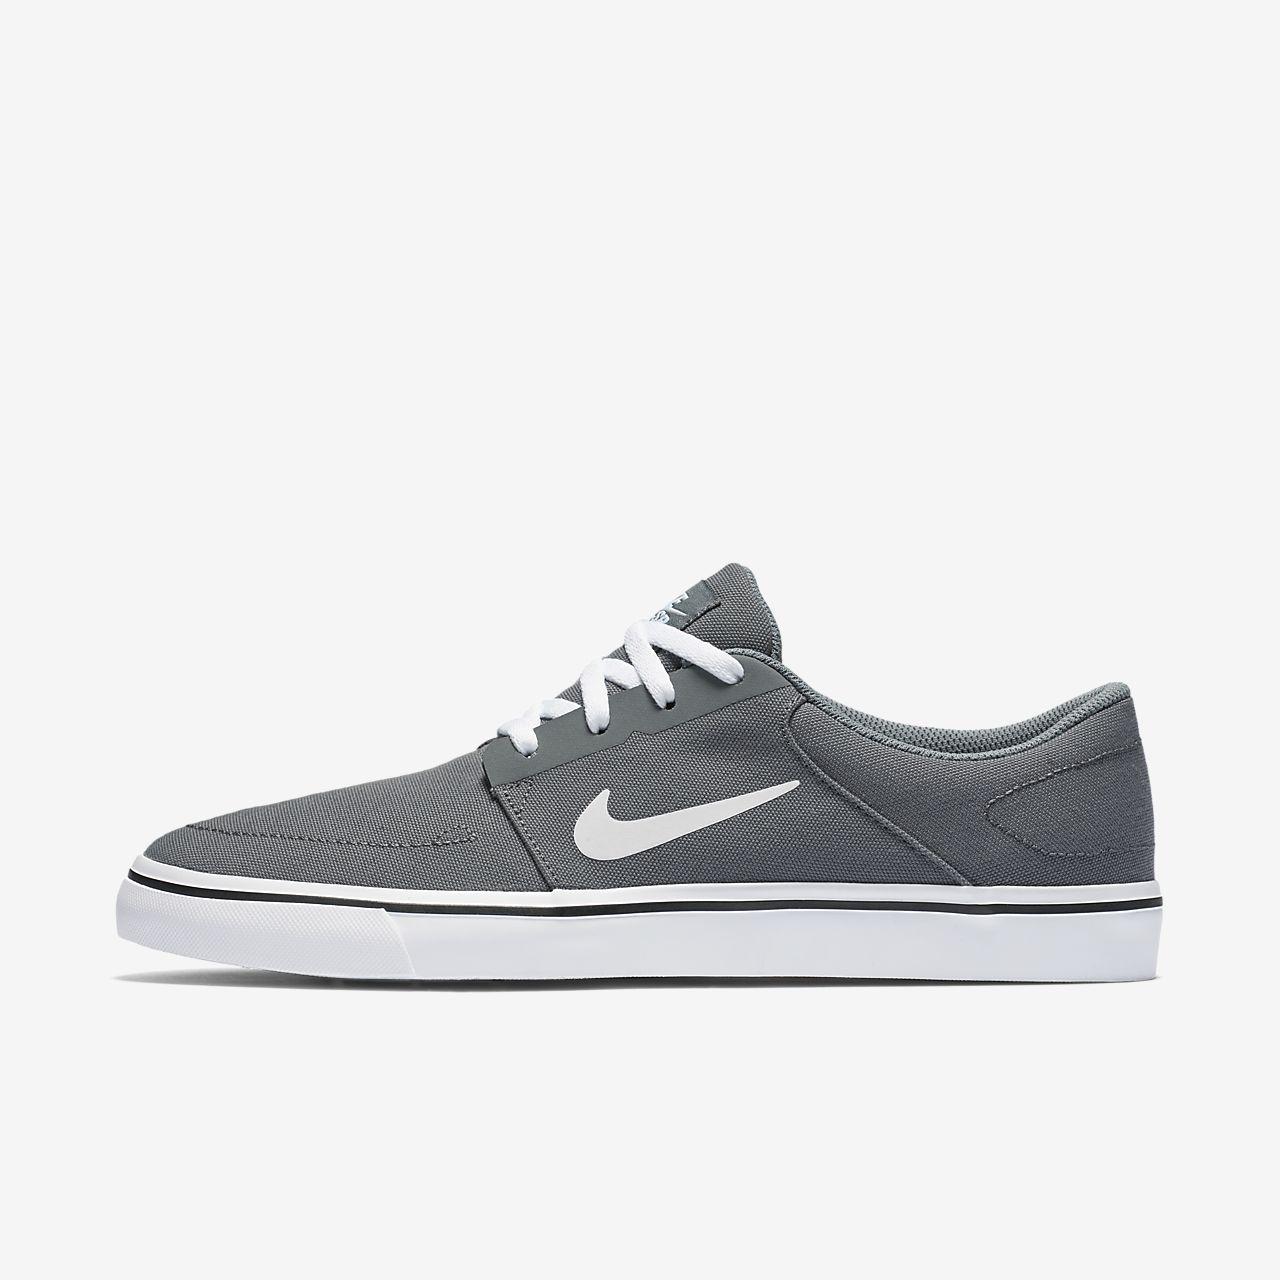 ... Nike SB Portmore Canvas Men's Skateboarding Shoe